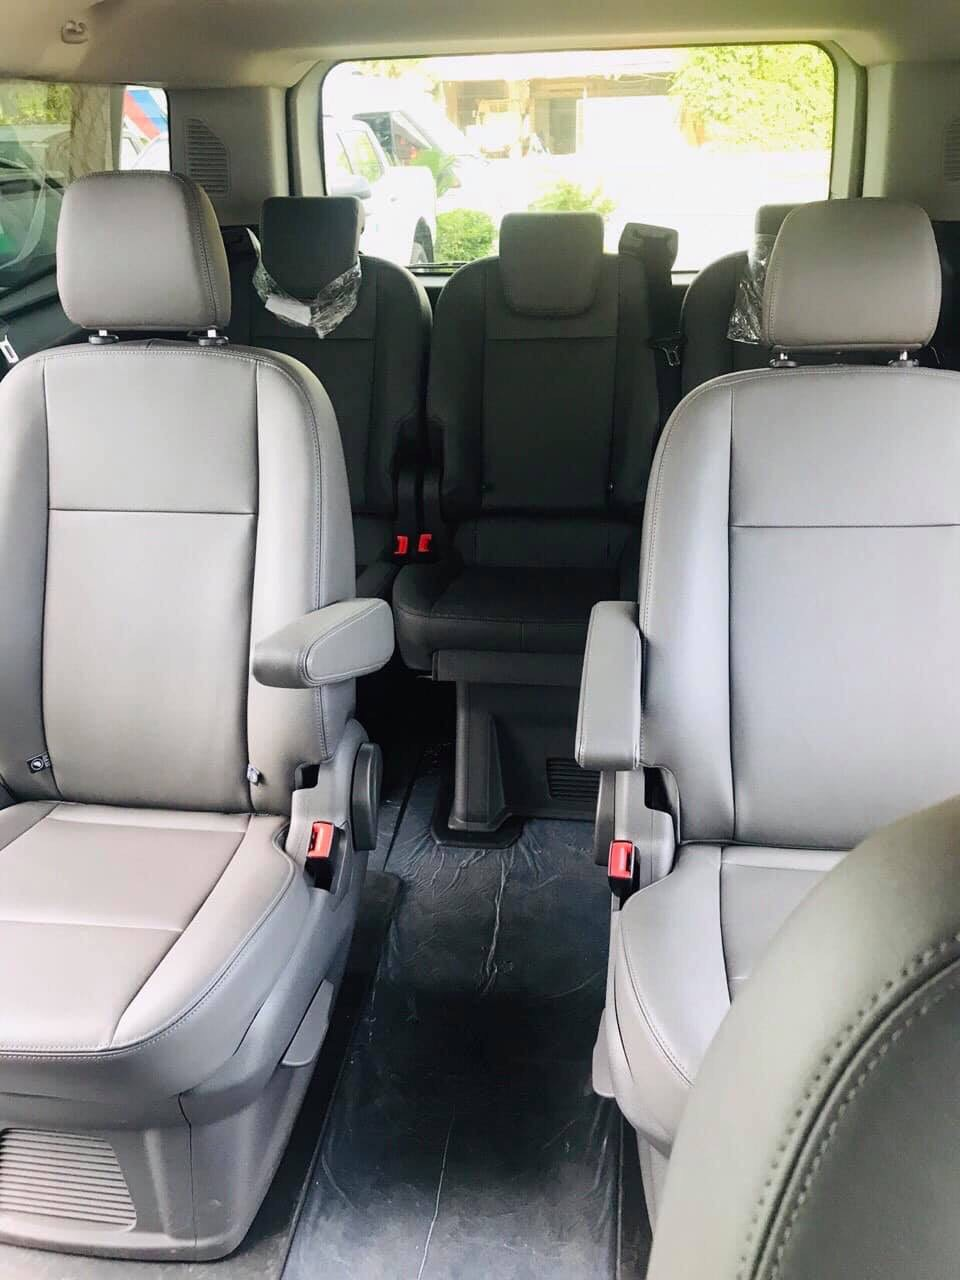 Cần bán Ford Tourneo Trend đời 2019